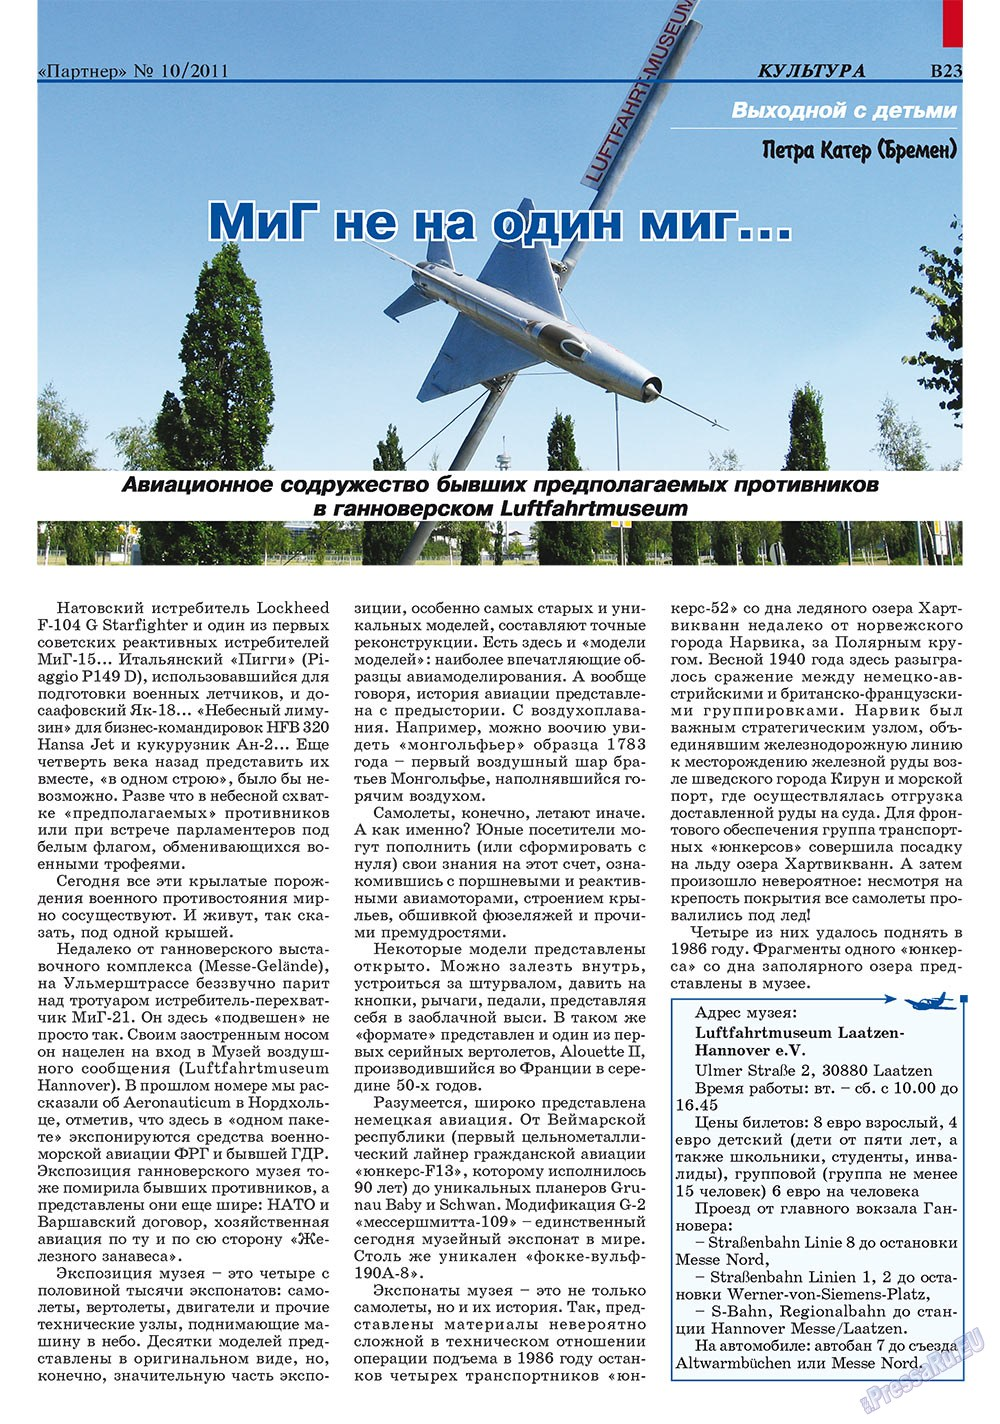 Партнер-север (журнал). 2011 год, номер 10, стр. 33